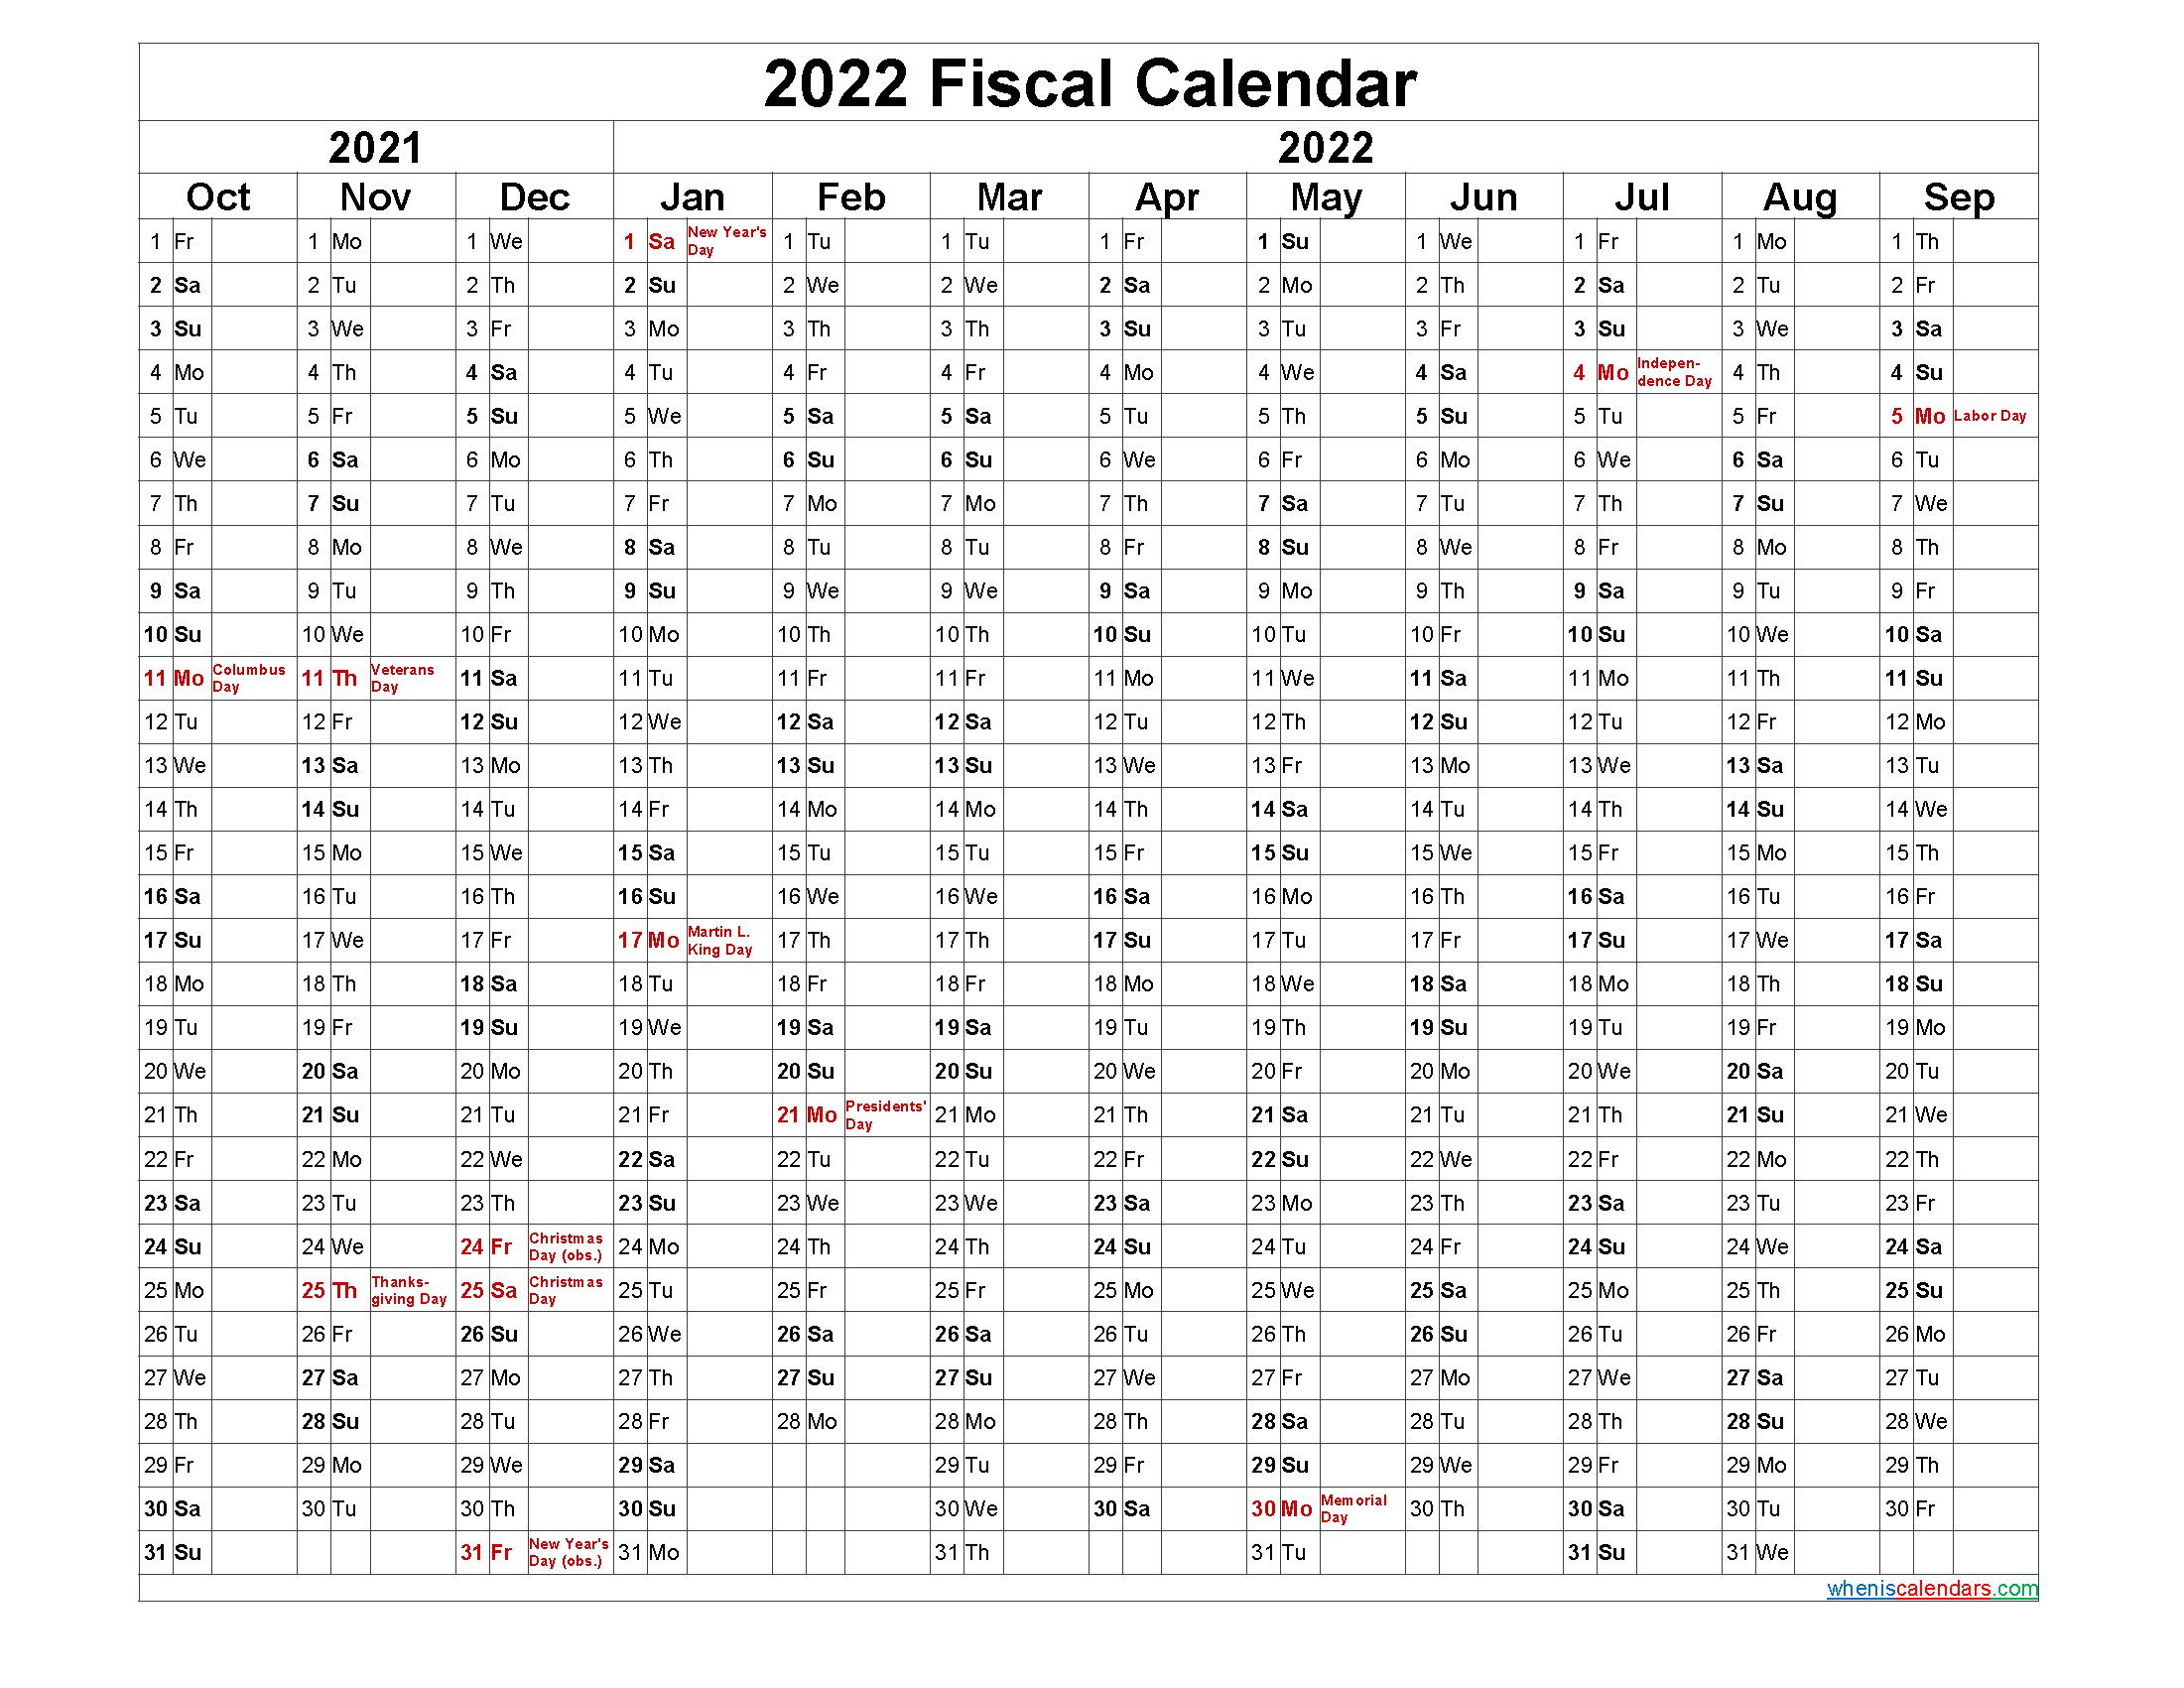 Fiscal Year Calendar 2022